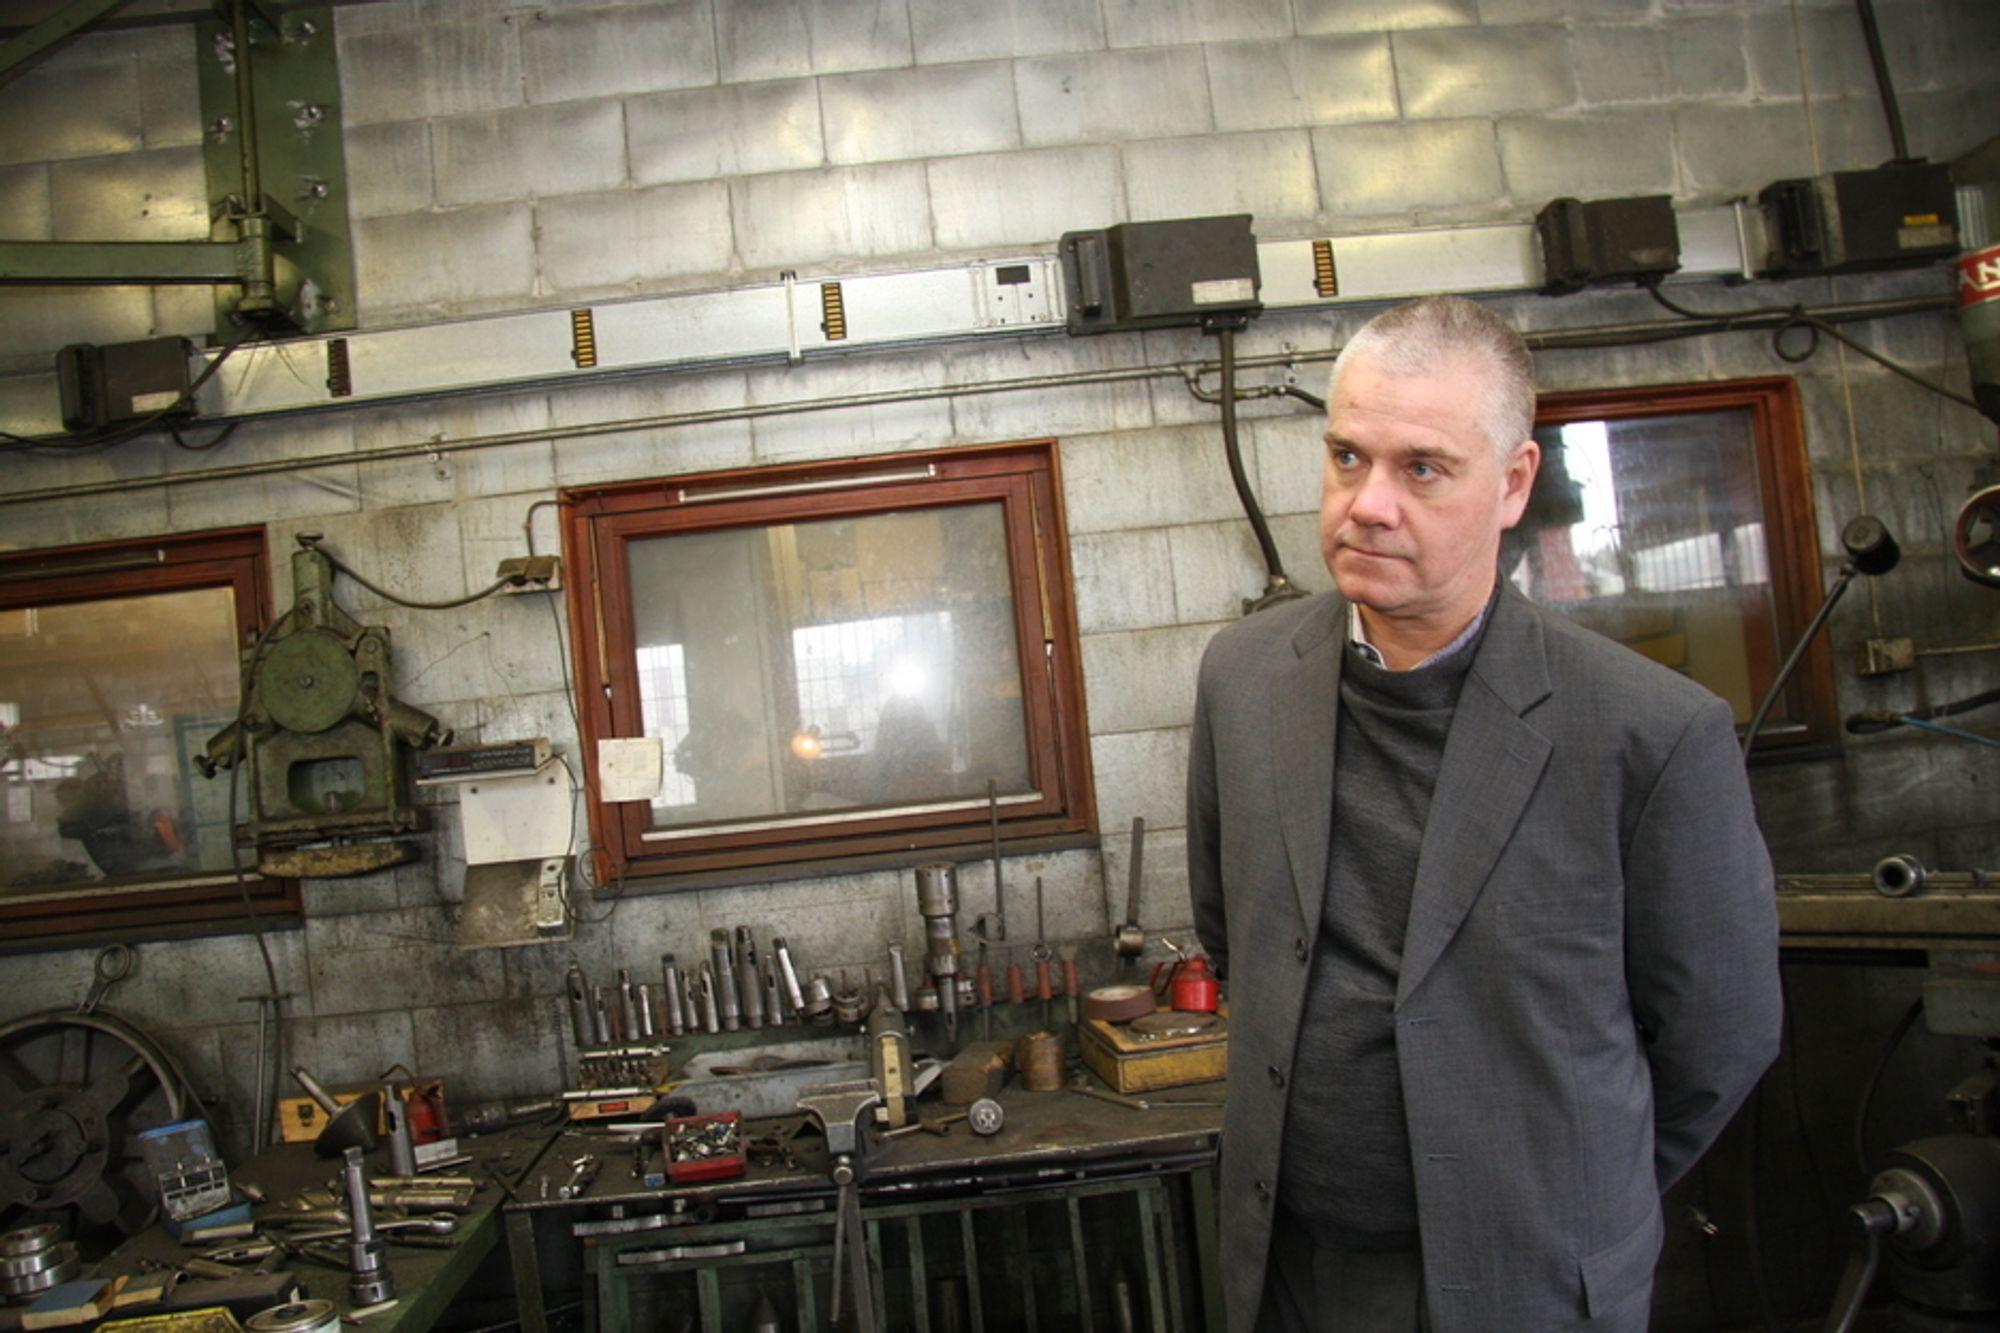 3c2ab952a48 MEGLER: Micke Bernakiewicz startet sitt eget bedriftsmeglingsselskap for  tre år siden. Nå har han